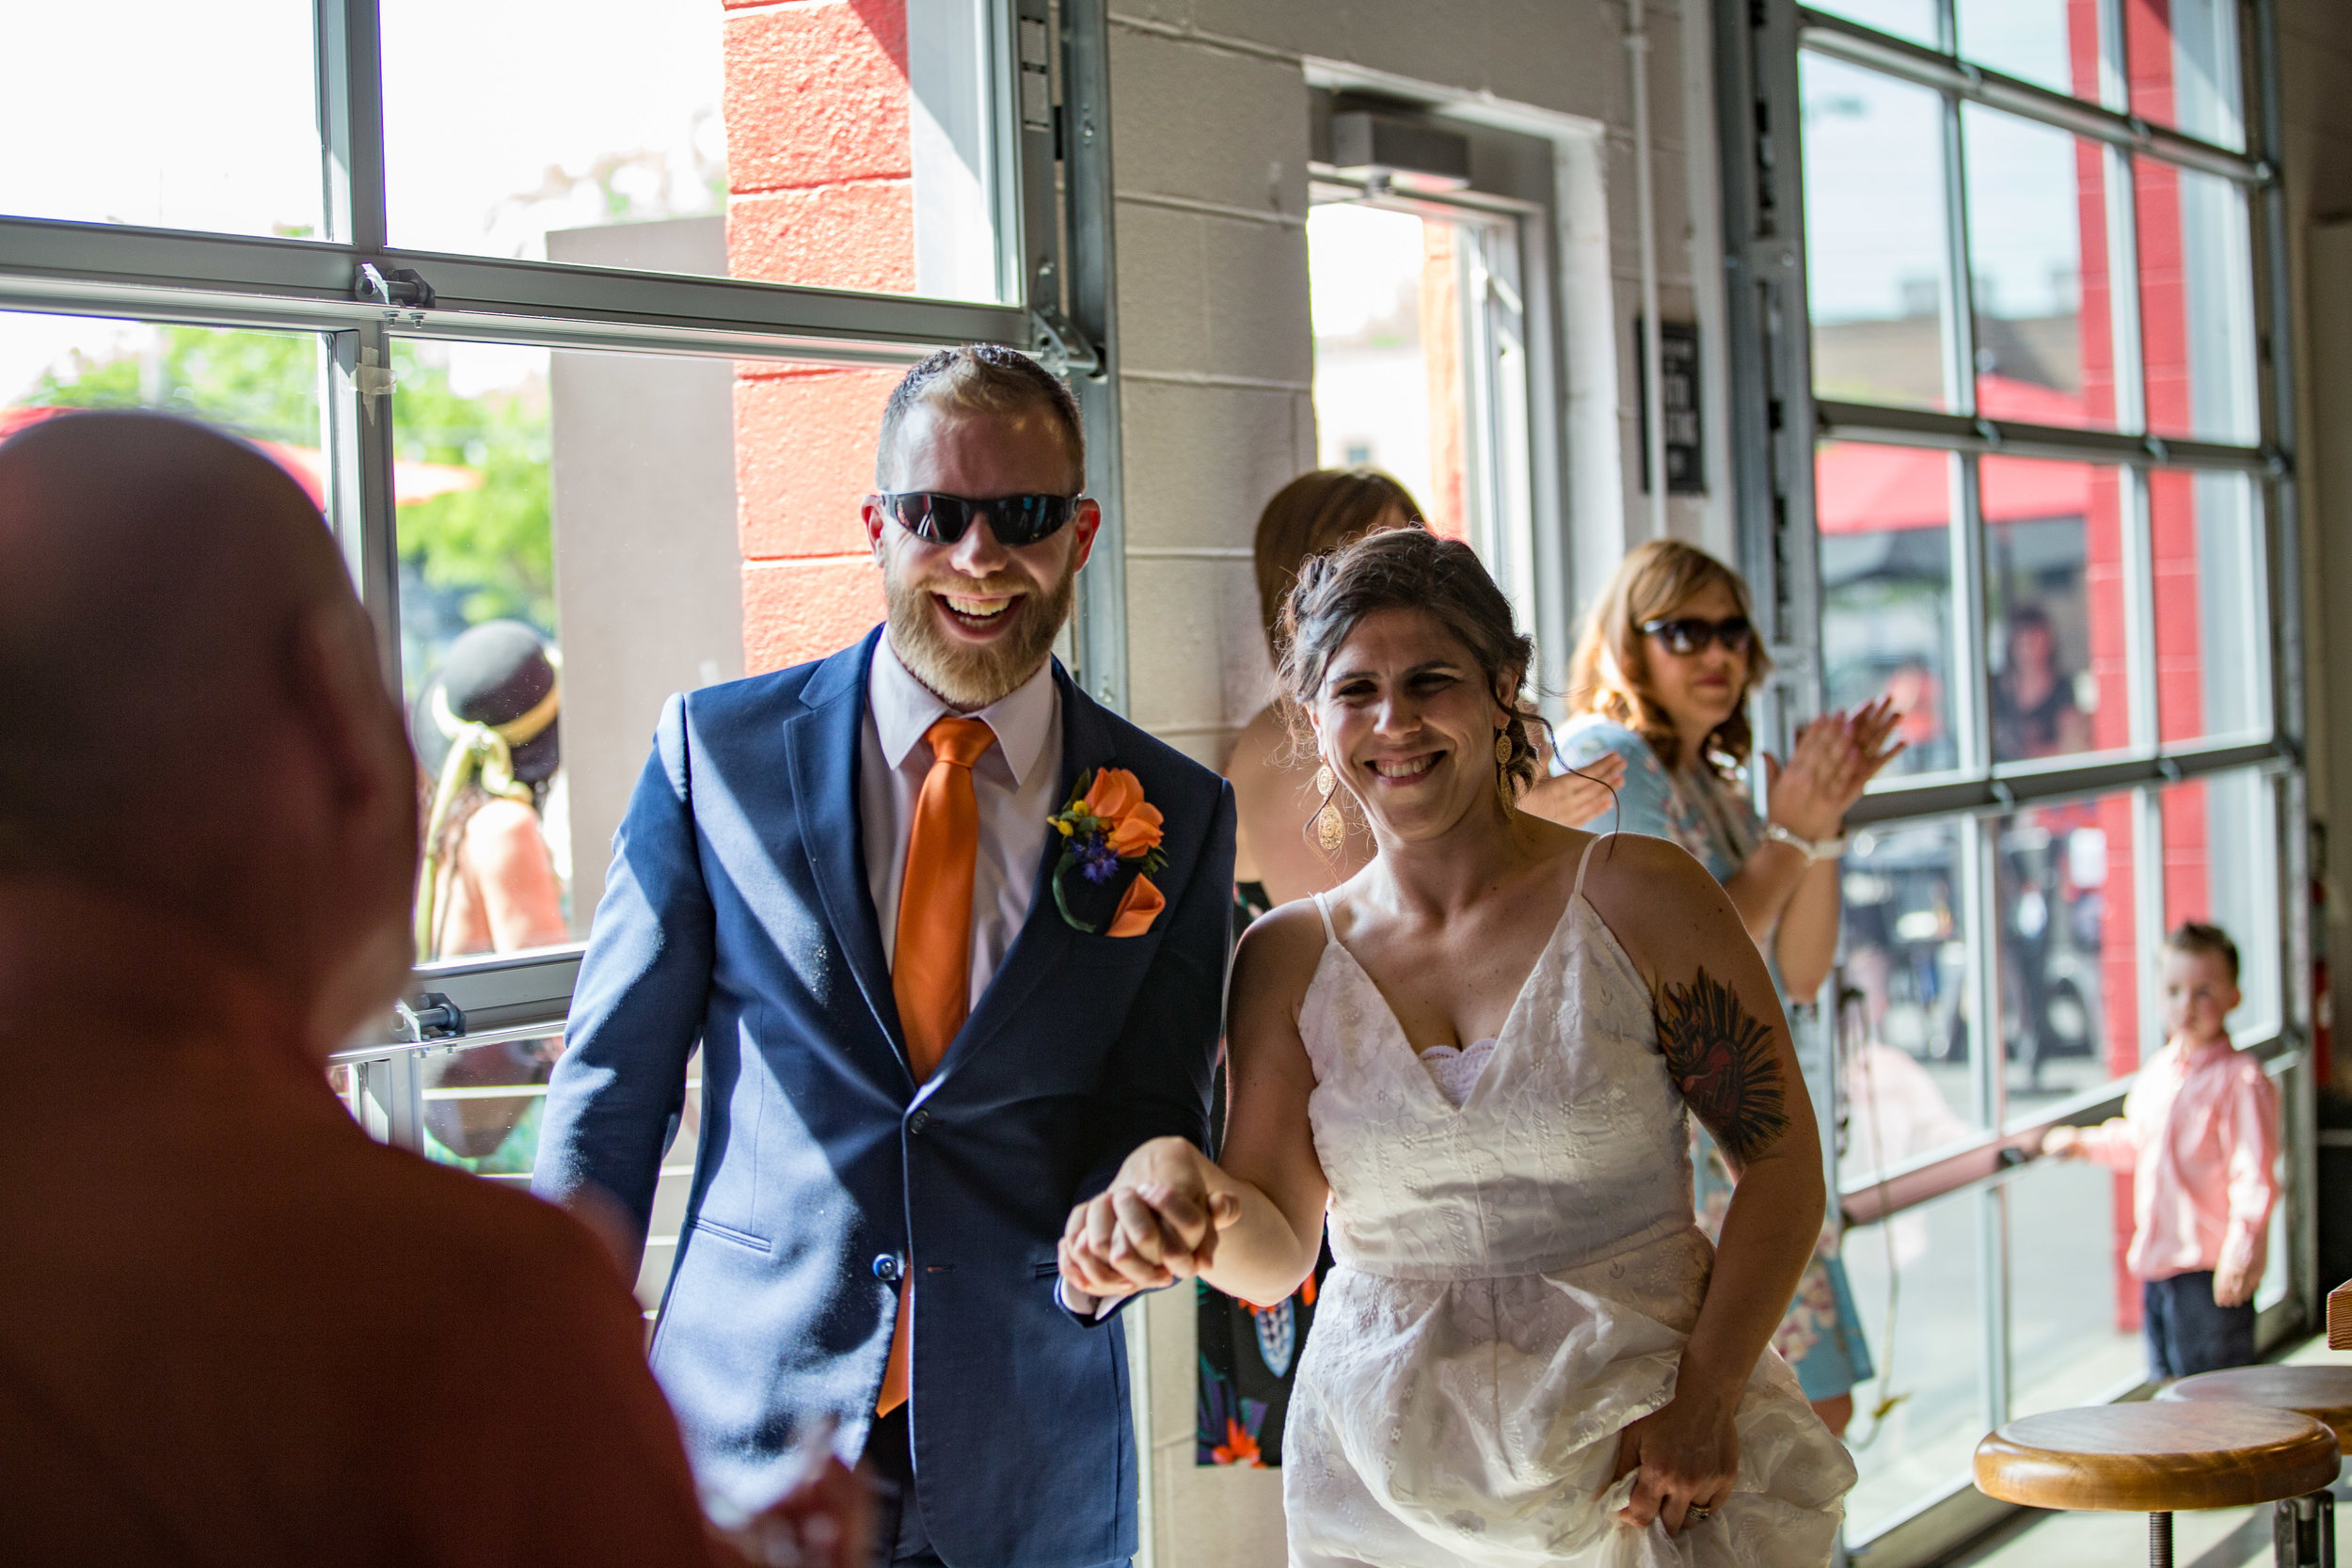 Natalie and Dallas Mooney Wedding 6-8-19_Tania Watt Photography-411.jpg